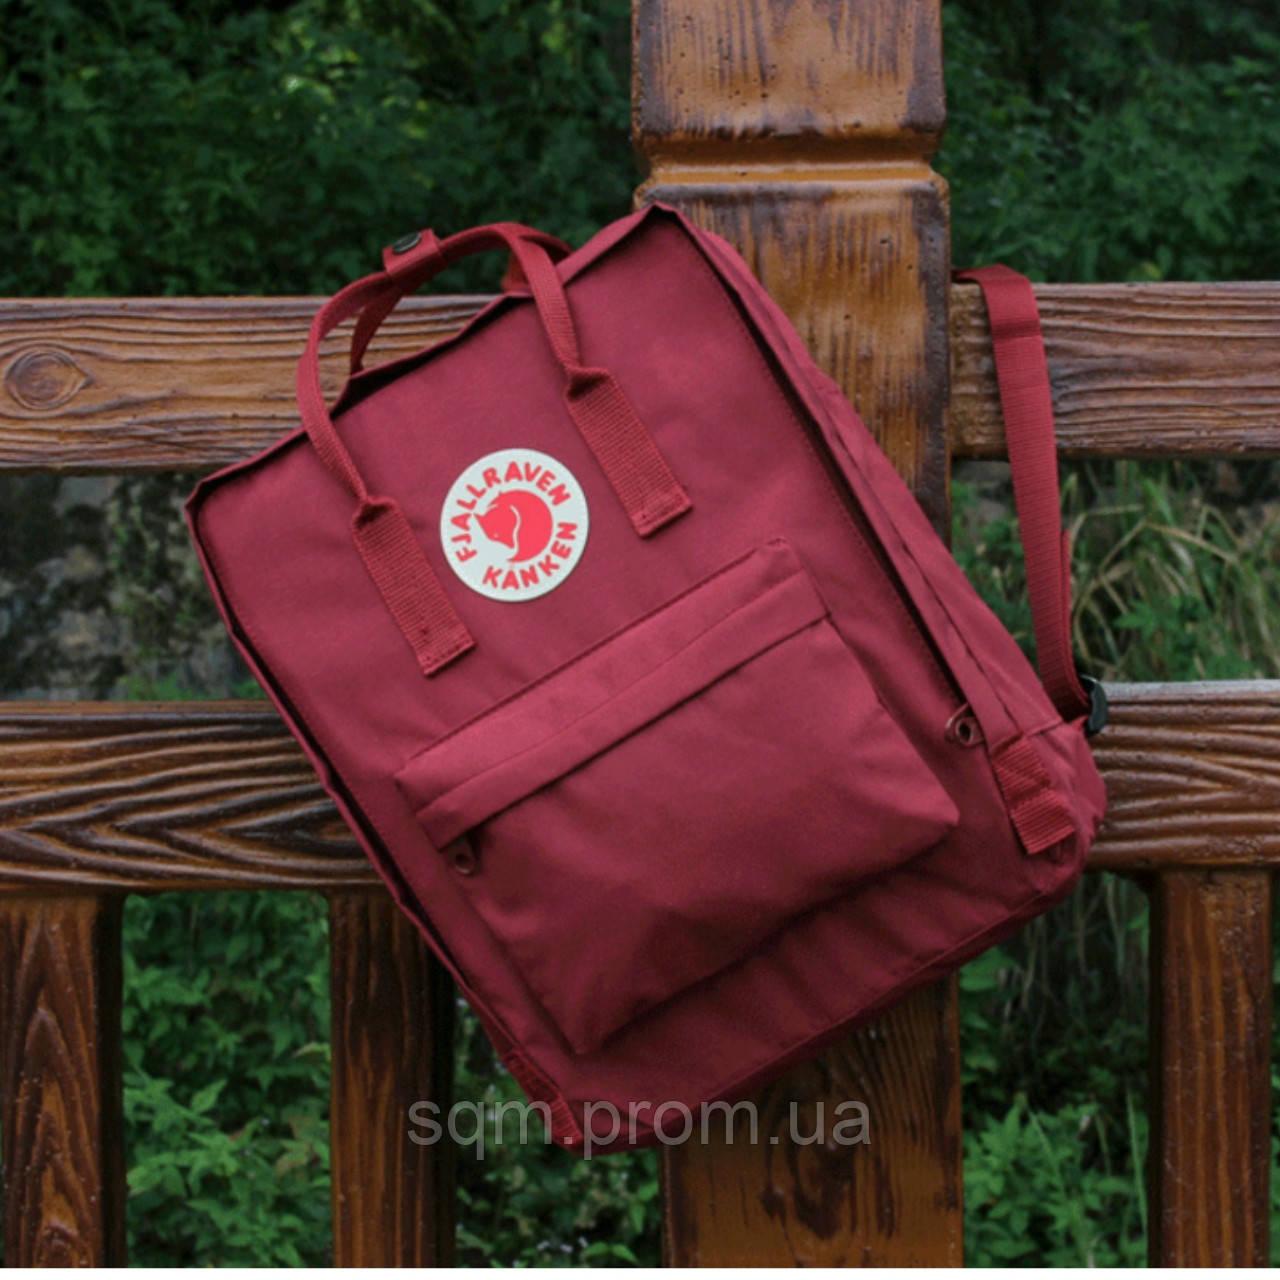 2d6934c6e163 Рюкзак Канкен сумка портфель Kanken Fjallraven Classic текстиль  рефлективное лого 8 цветов 16л реплика